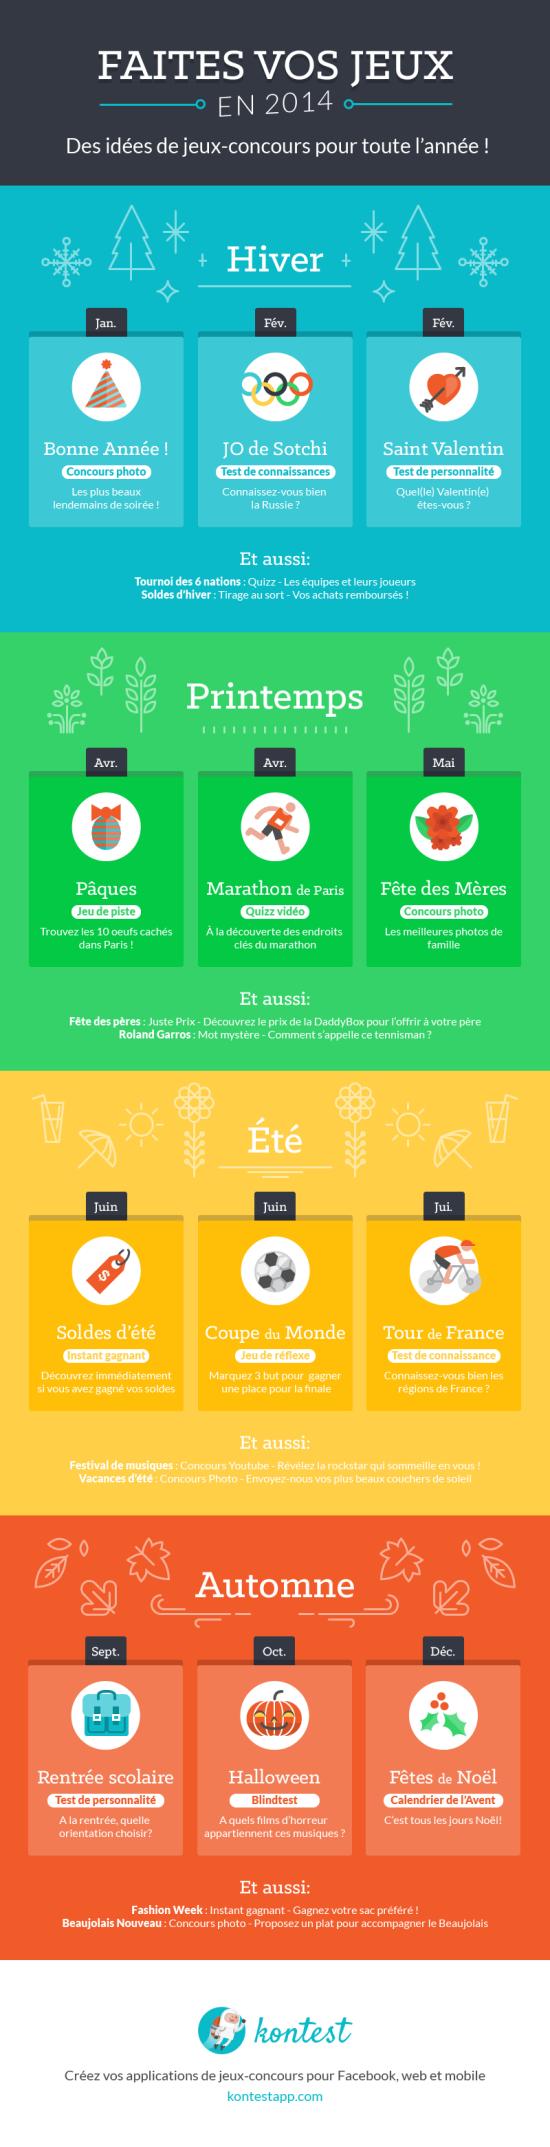 Epingle Sur Webmarketing